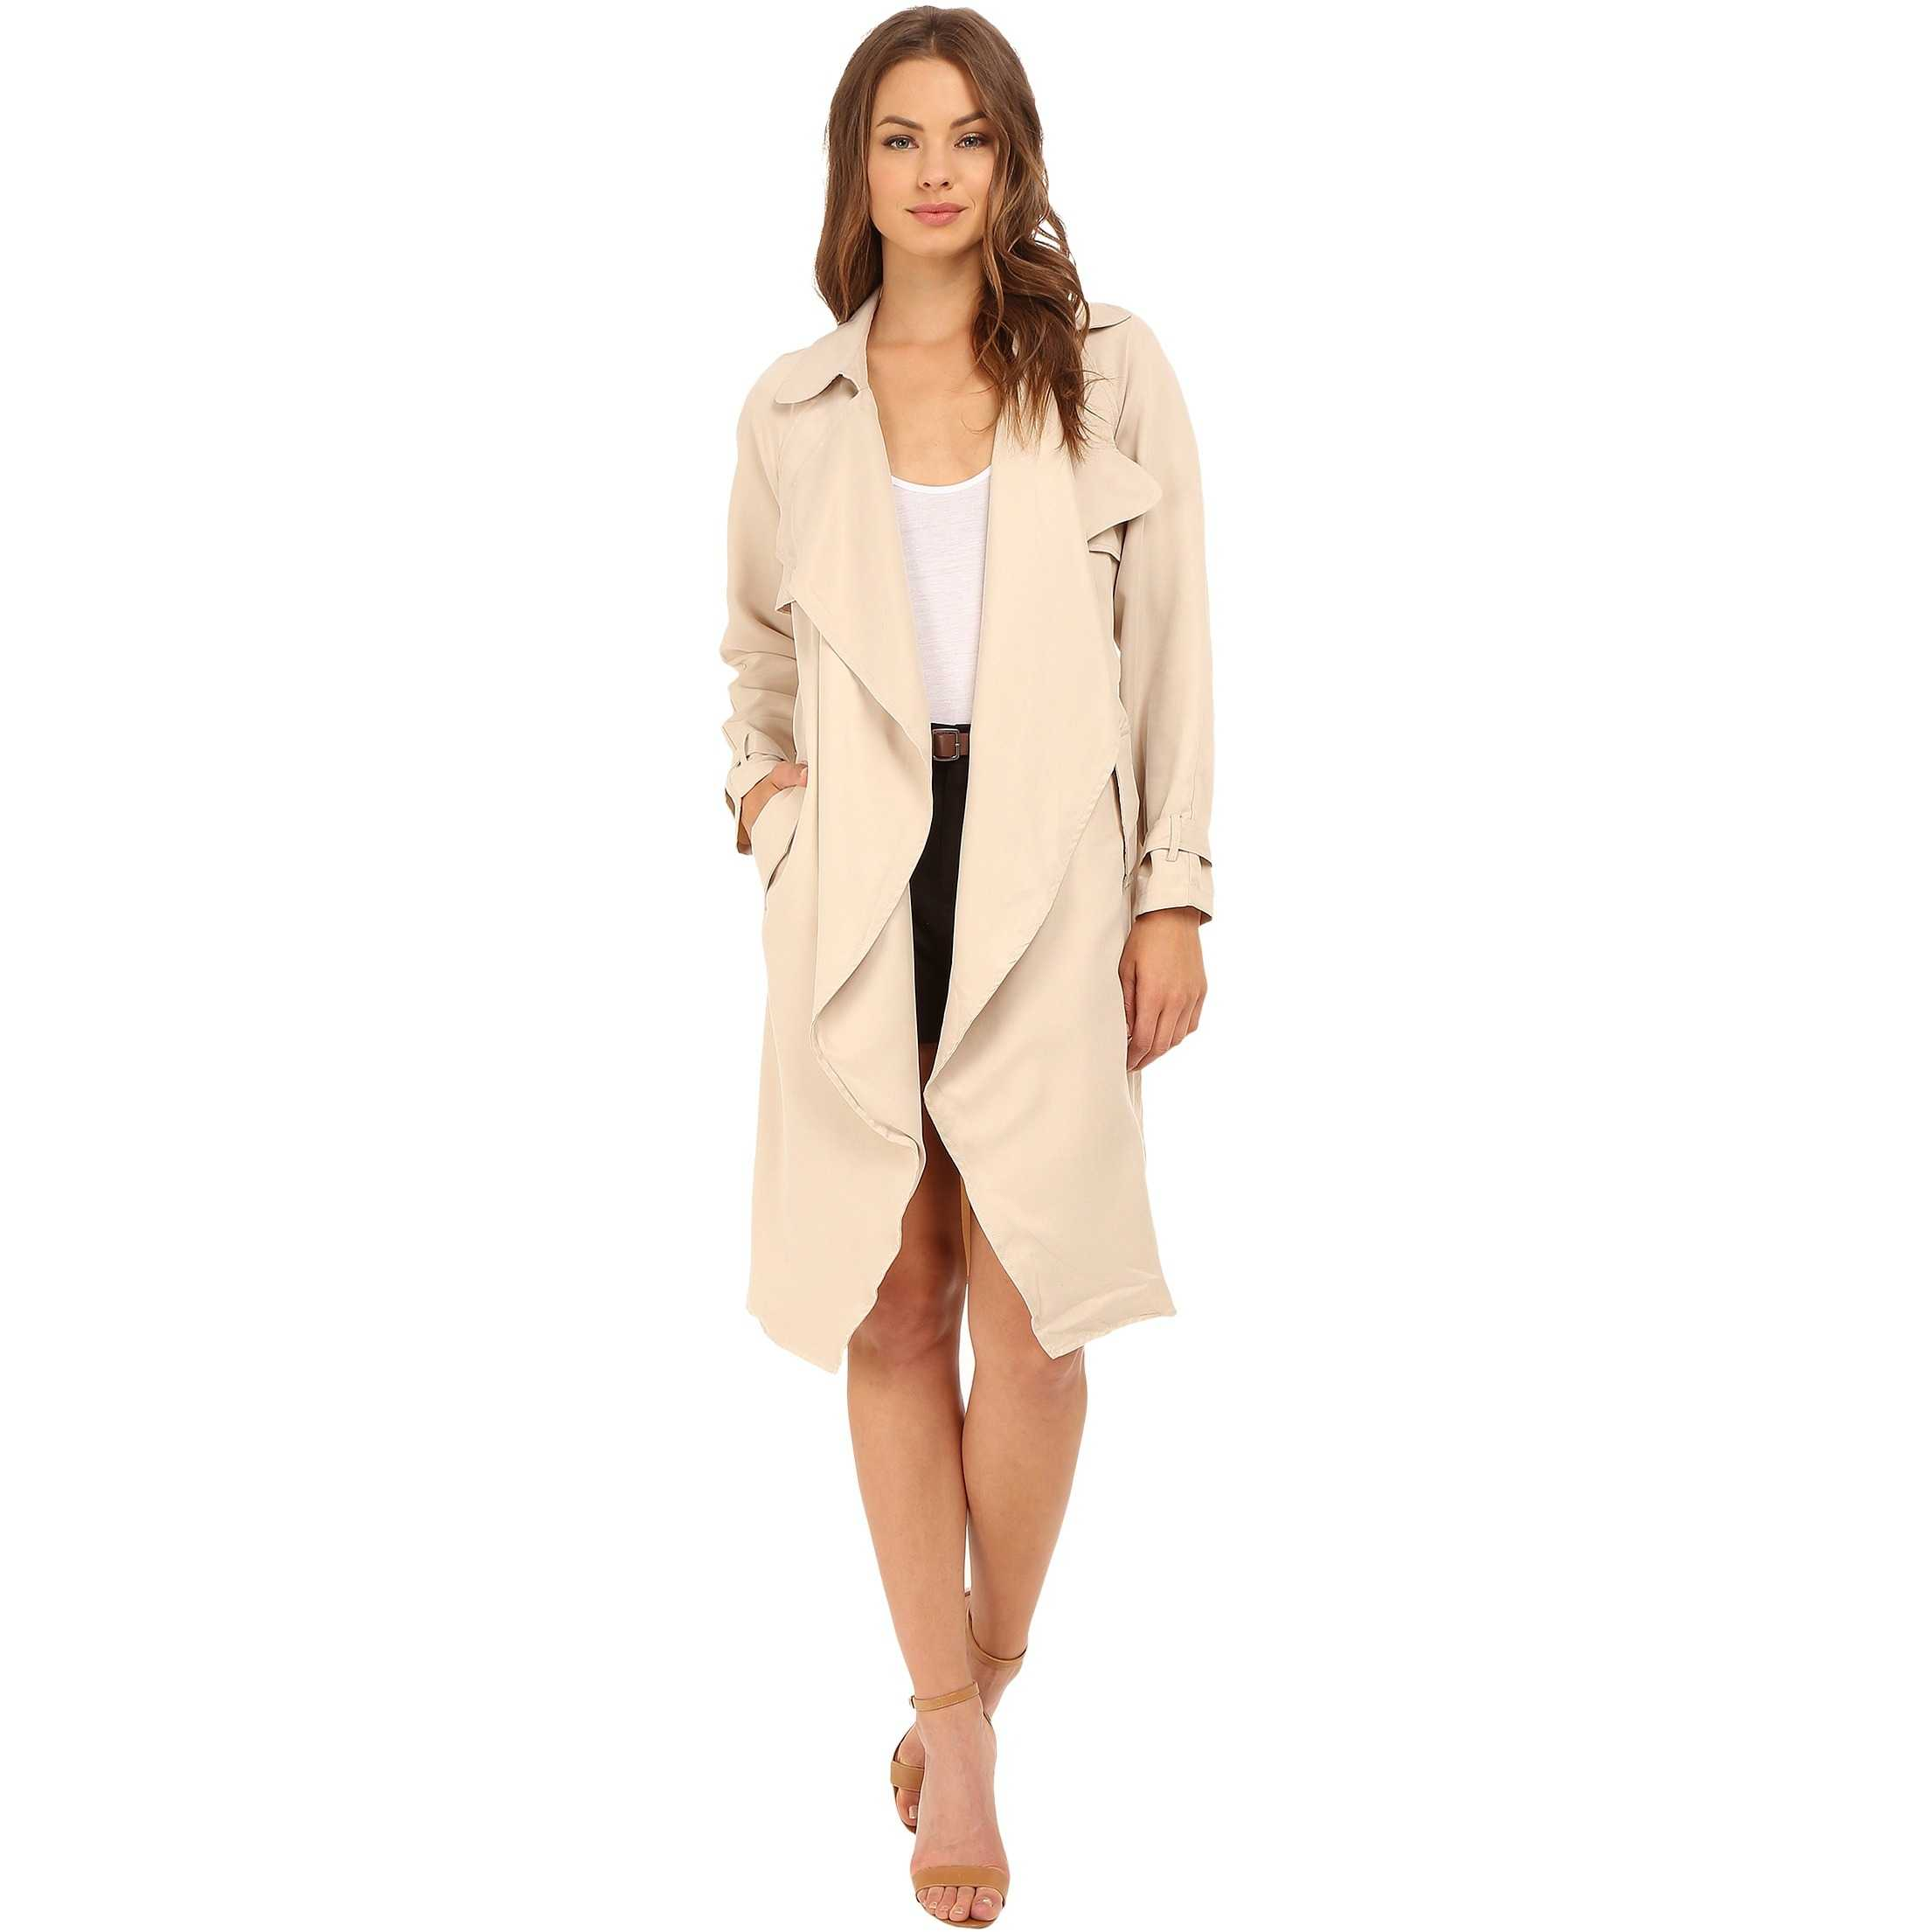 Brigitte Bailey Adela Trench-Style Jacket Sand trench dama